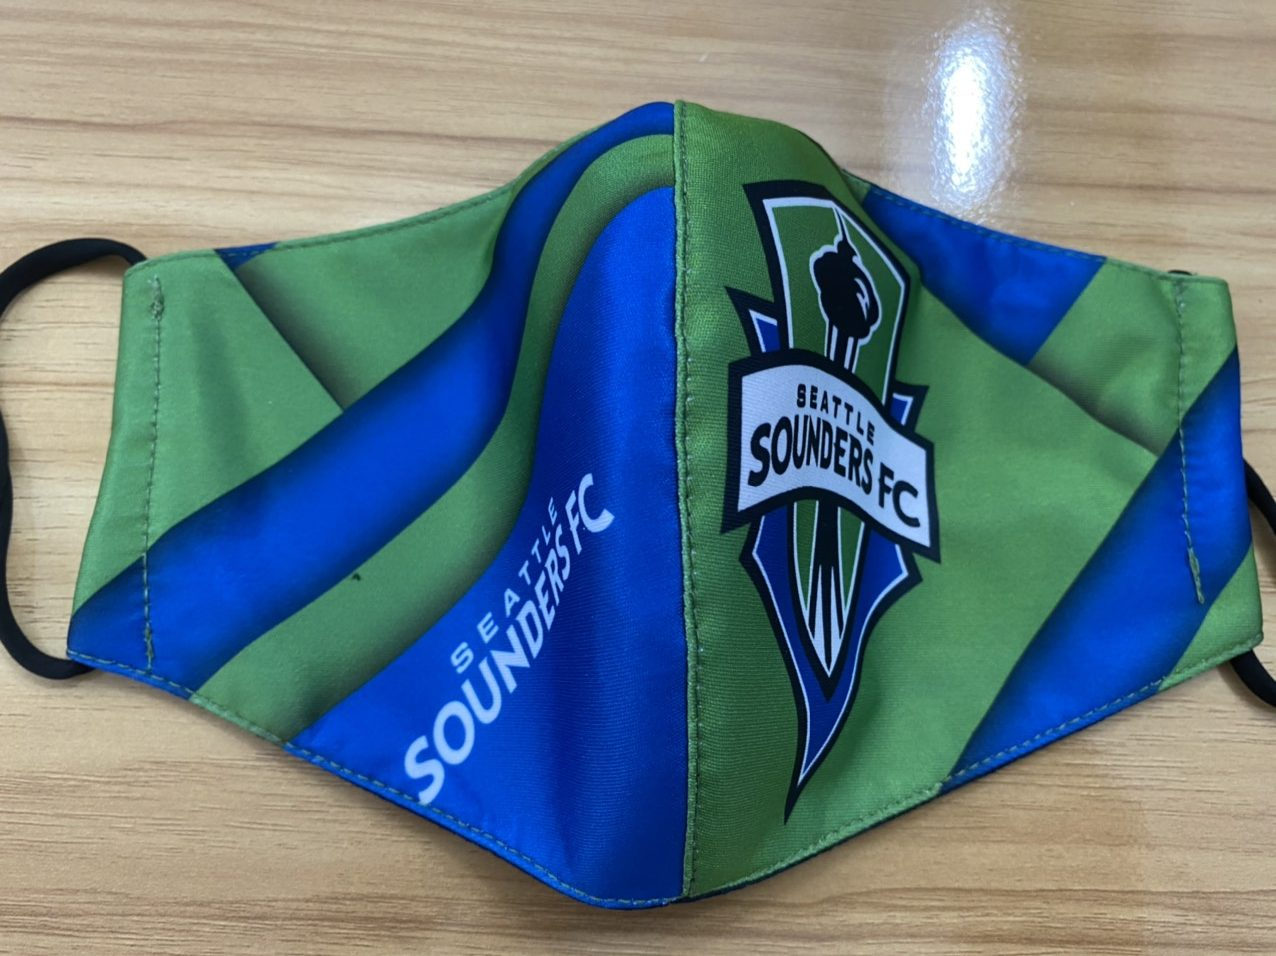 Khẩu Trang Vải In Logo SEATTLE SOUDERS FC 2 Lớp - Mẫu Khẩu Trang In 3D Logo Đội Bóng SEATTLE SOUNDERS FC Nền Xanh 7